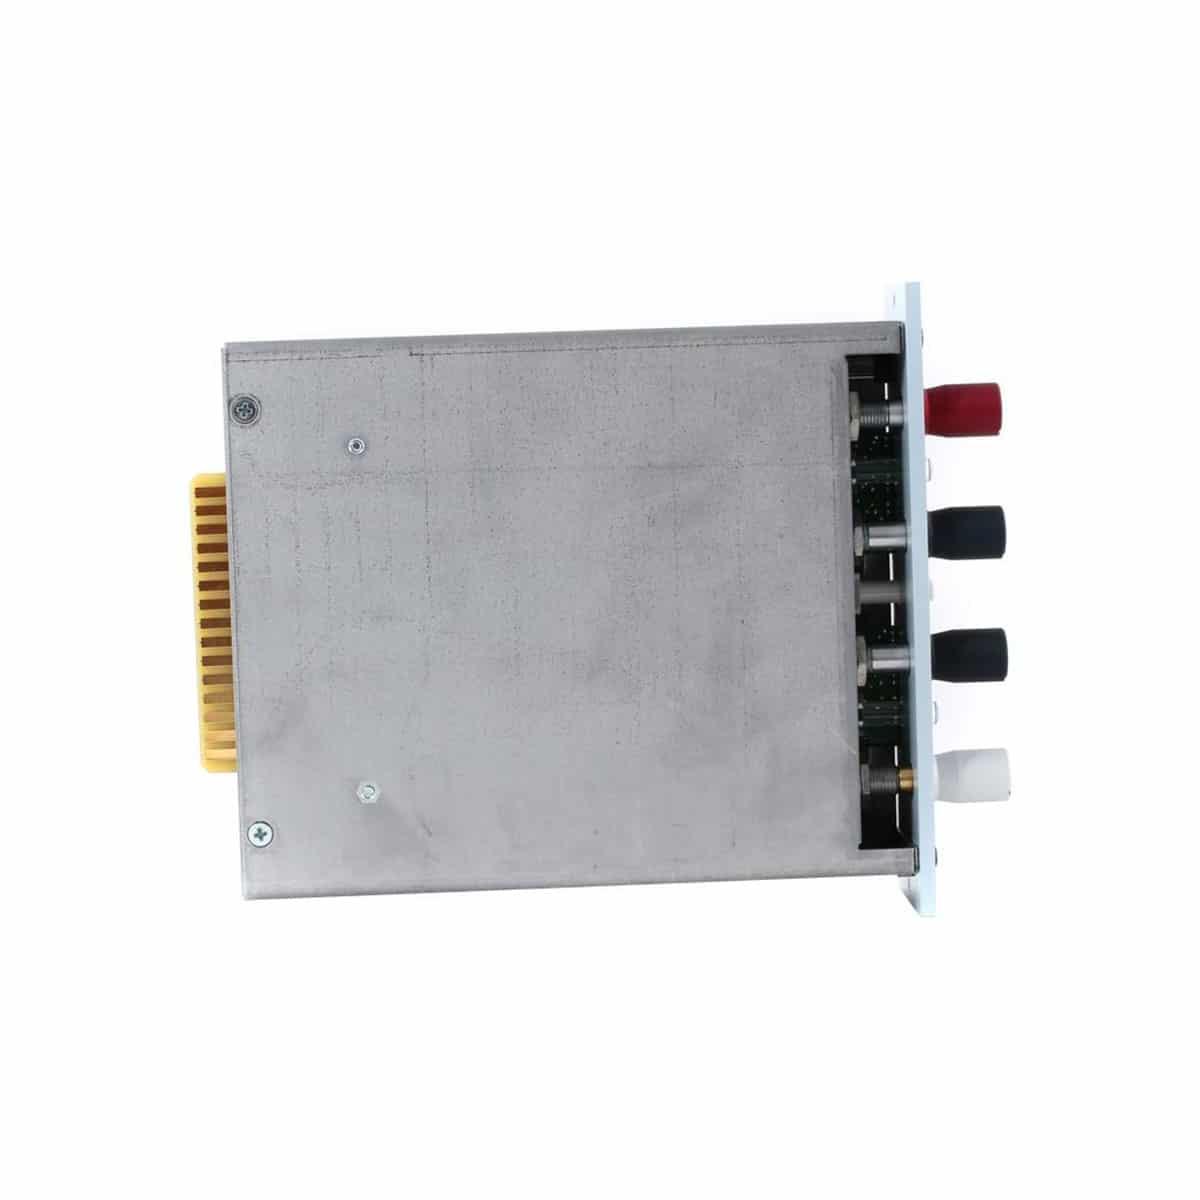 Rupert Neve 542 04 Effetti, Pro Audio, Outboard, Compressori